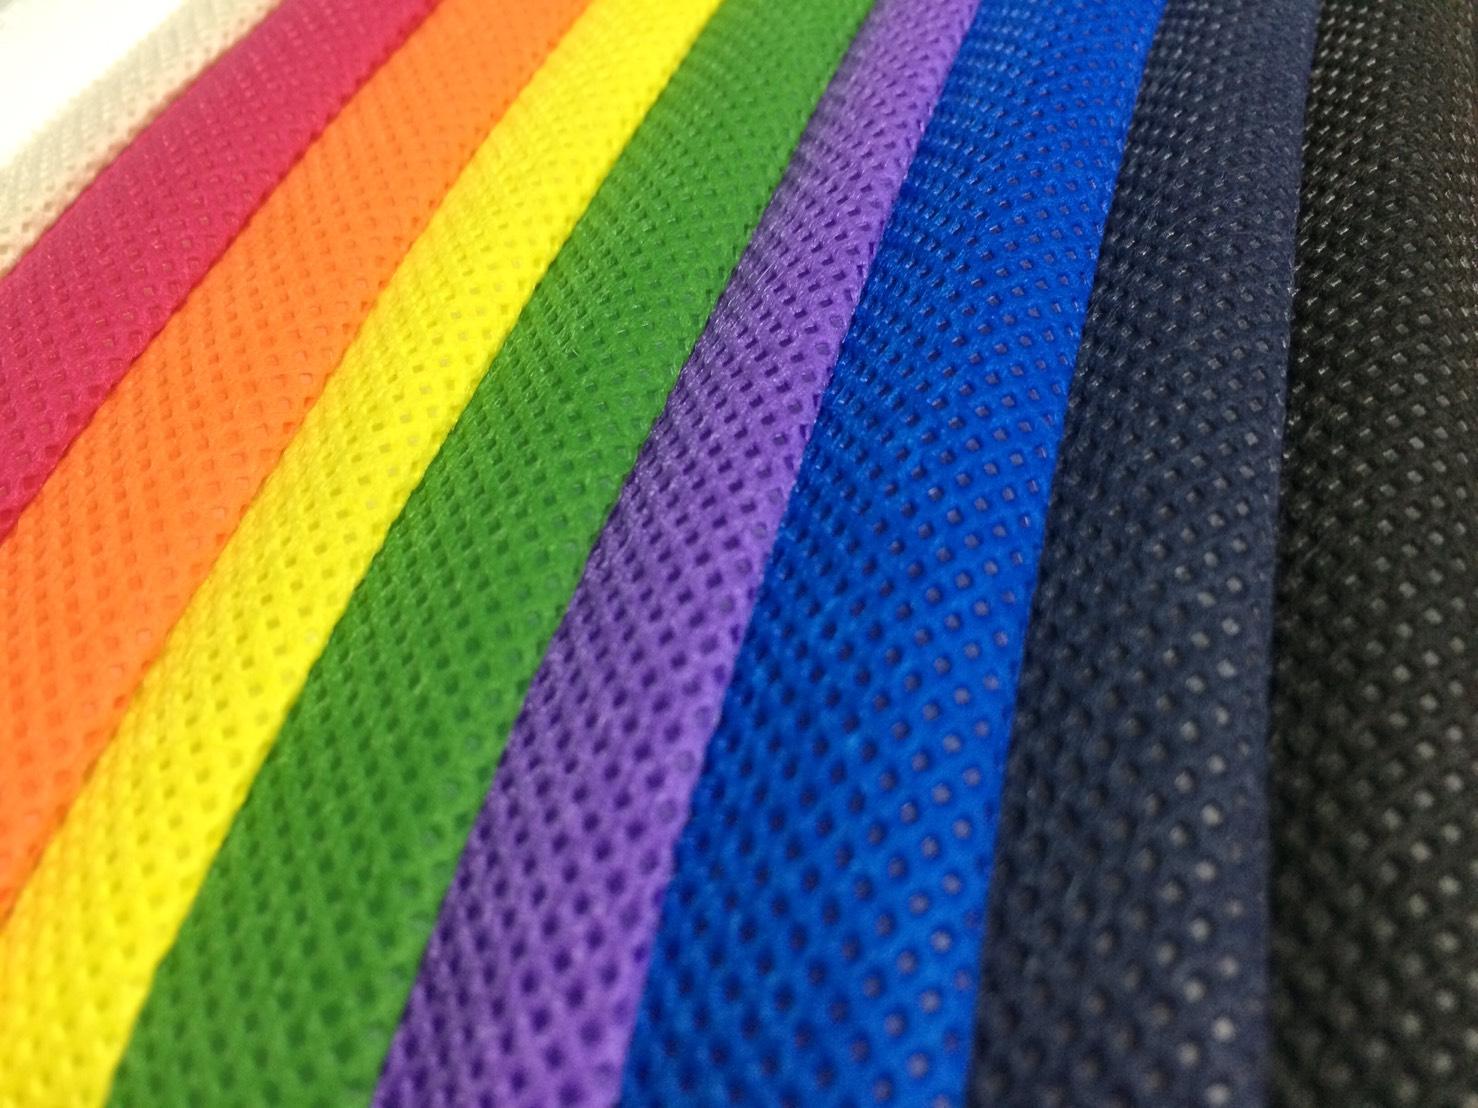 Spunbond Nonwoven Fabric 100G